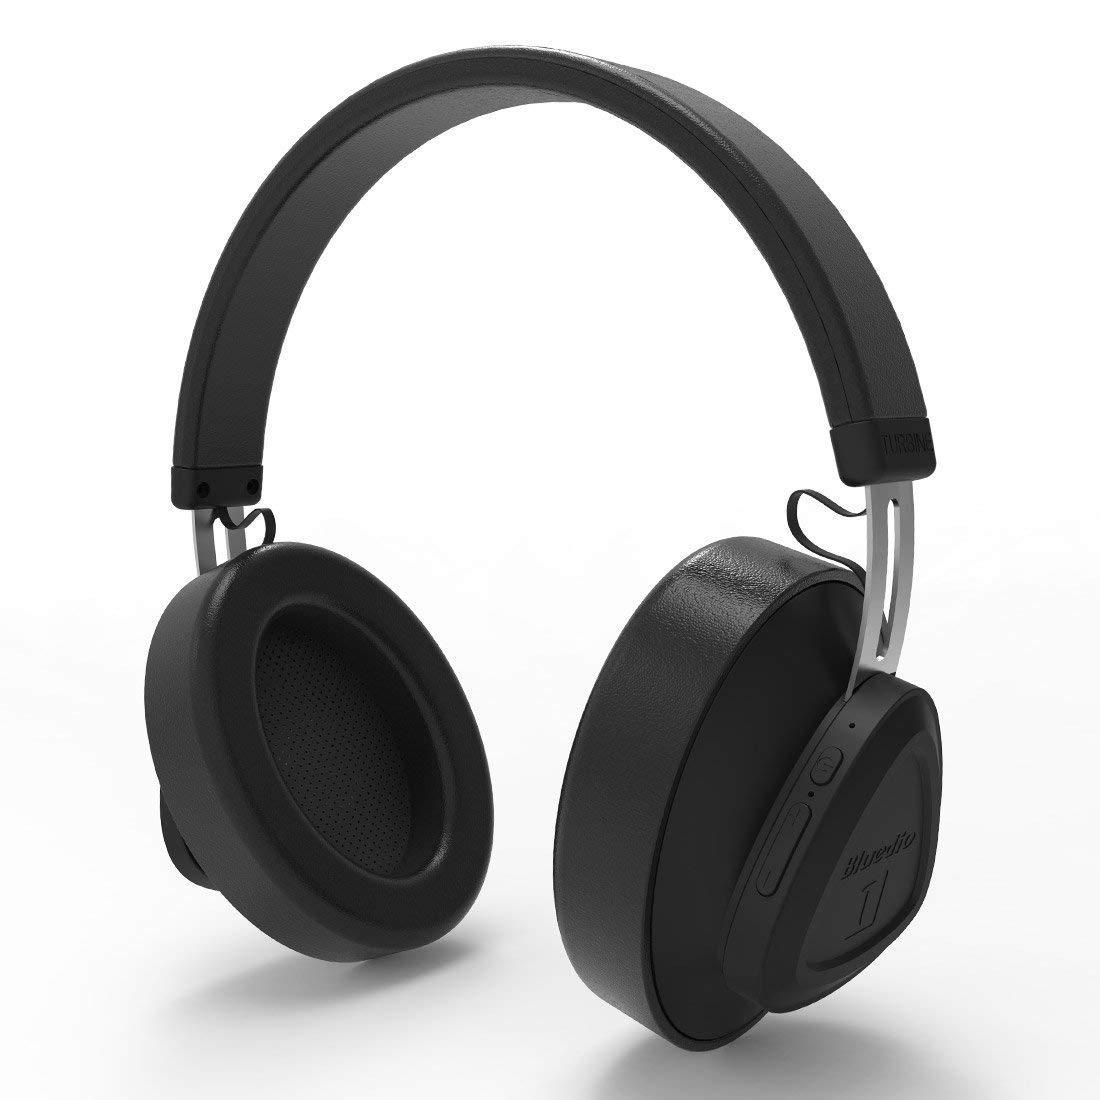 bd9247f300d Bluedio TM Bluetooth 5.0 On-Ear Headphones Voice: Amazon.in: Electronics